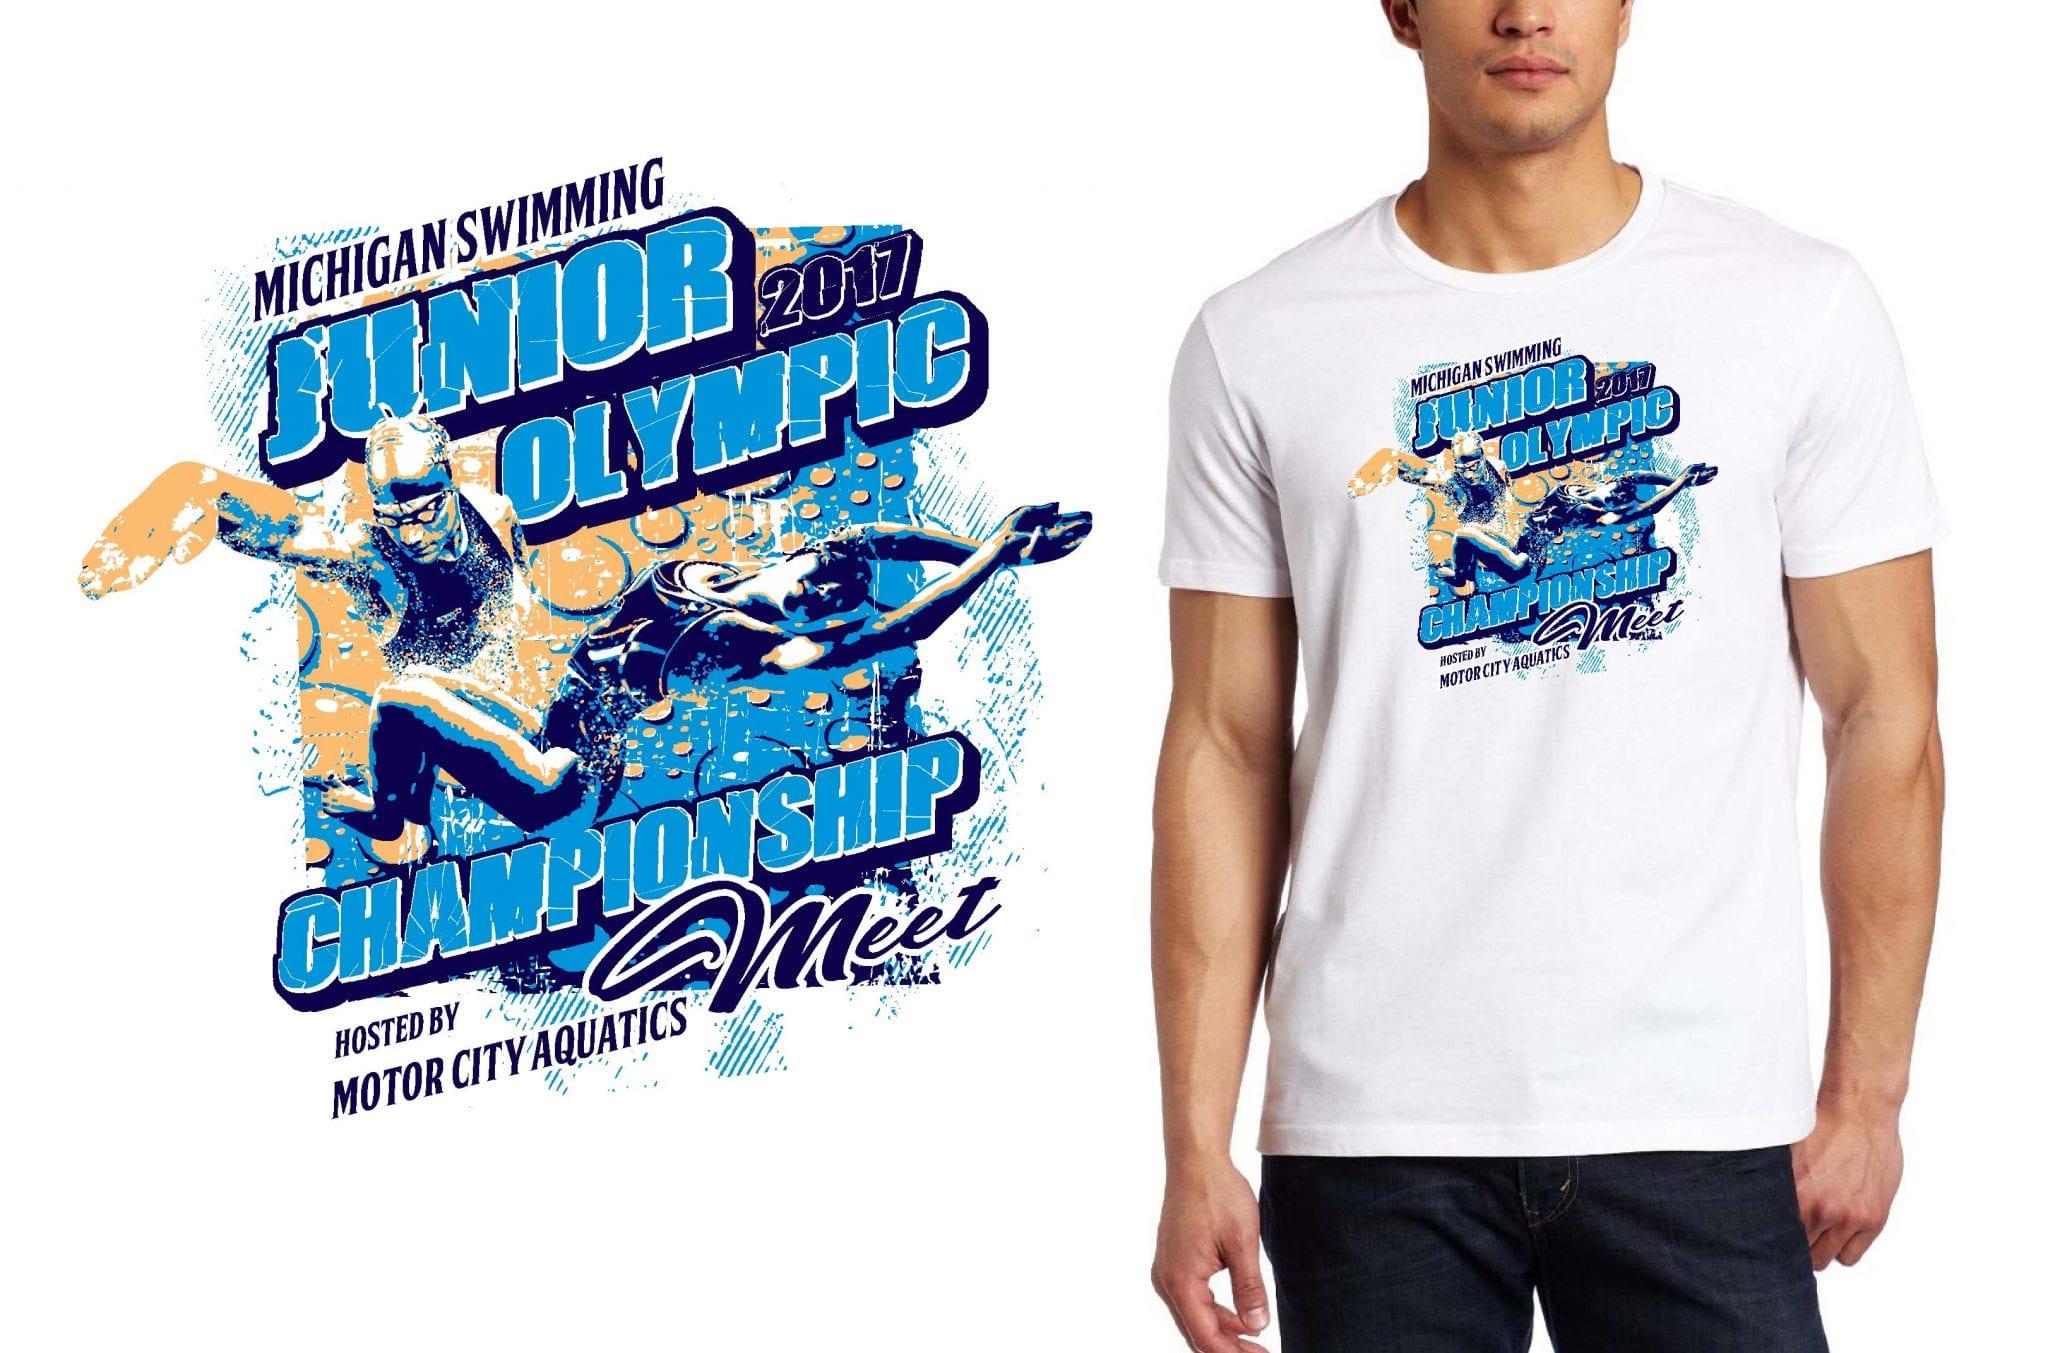 swimming TSHIRT LOGO DESIGN Junior-Olympic-Championship-Meet UrArtStudio